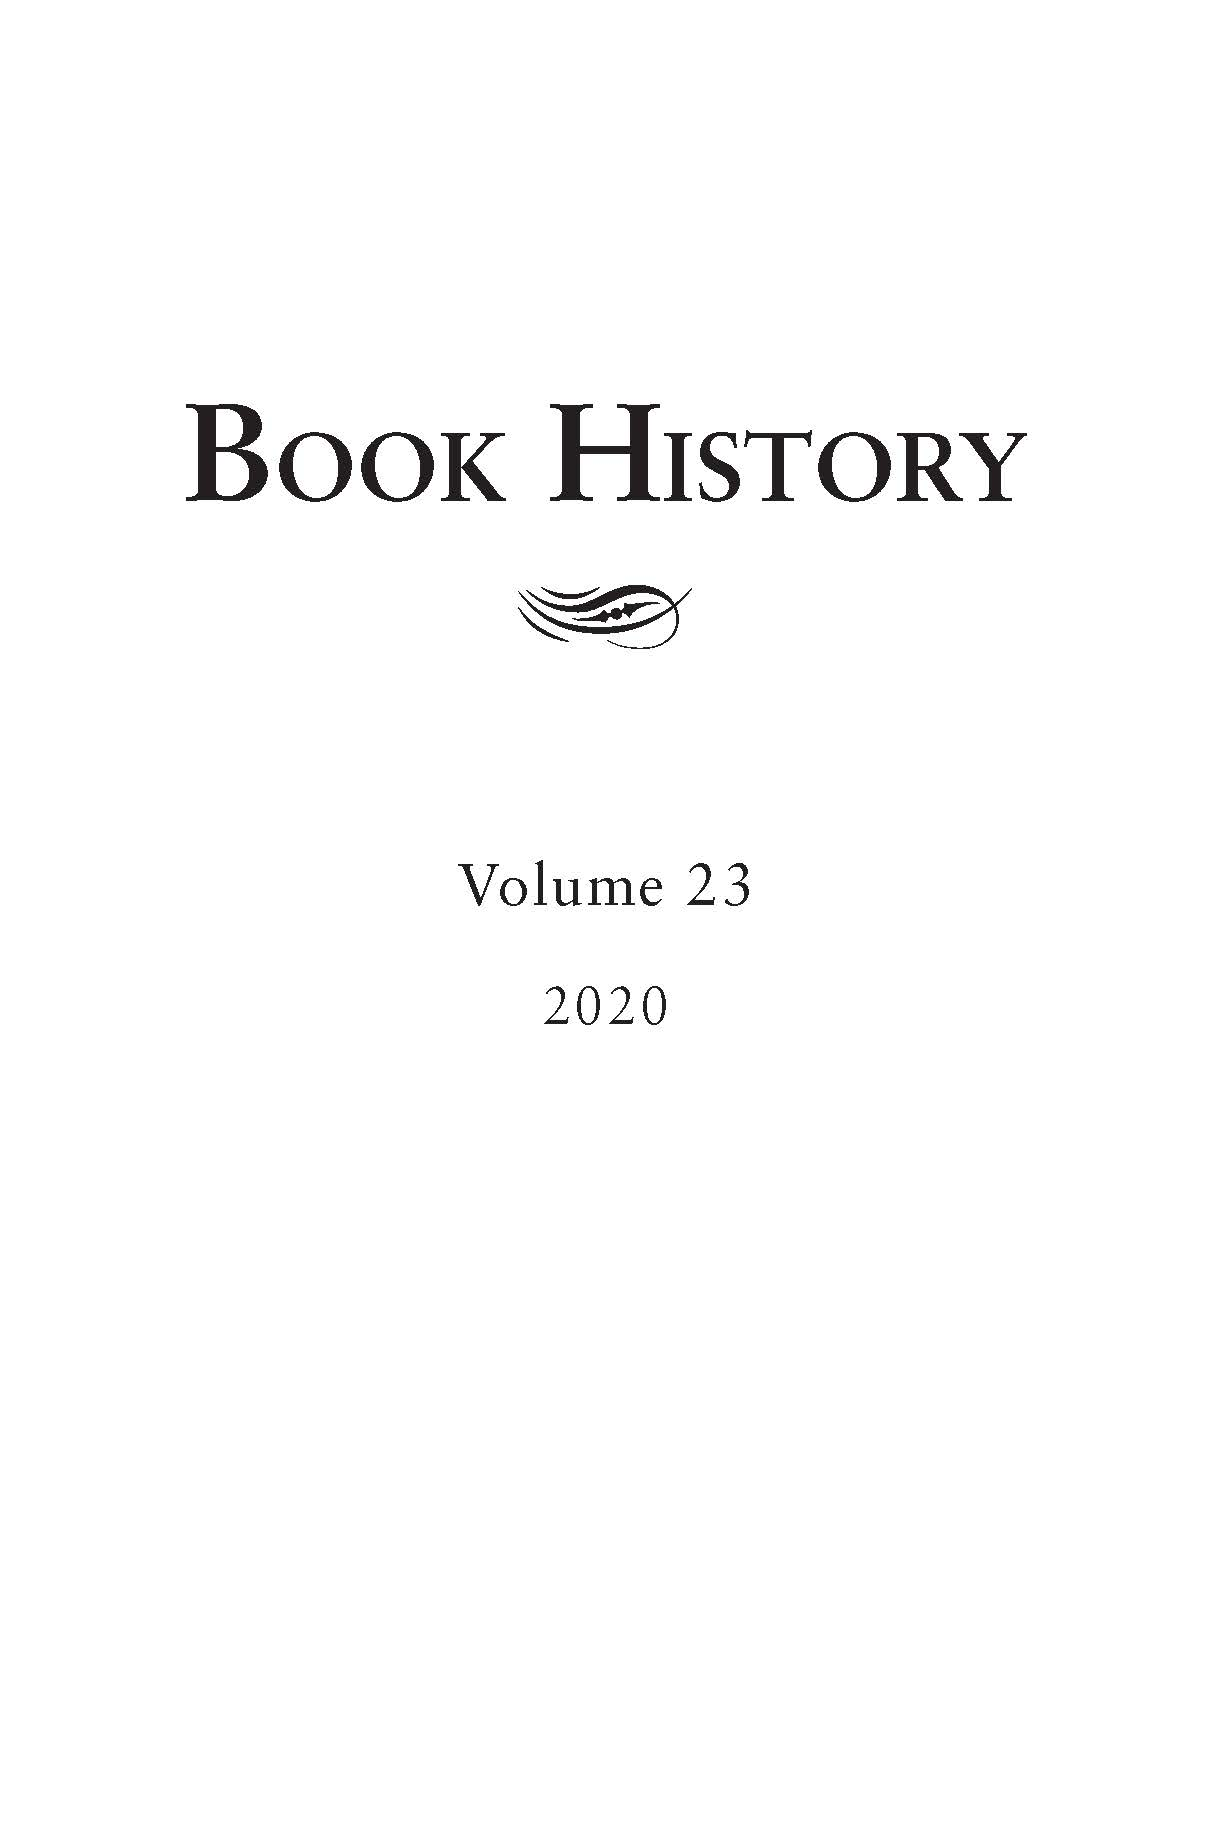 Book History: Volume 23, 2020